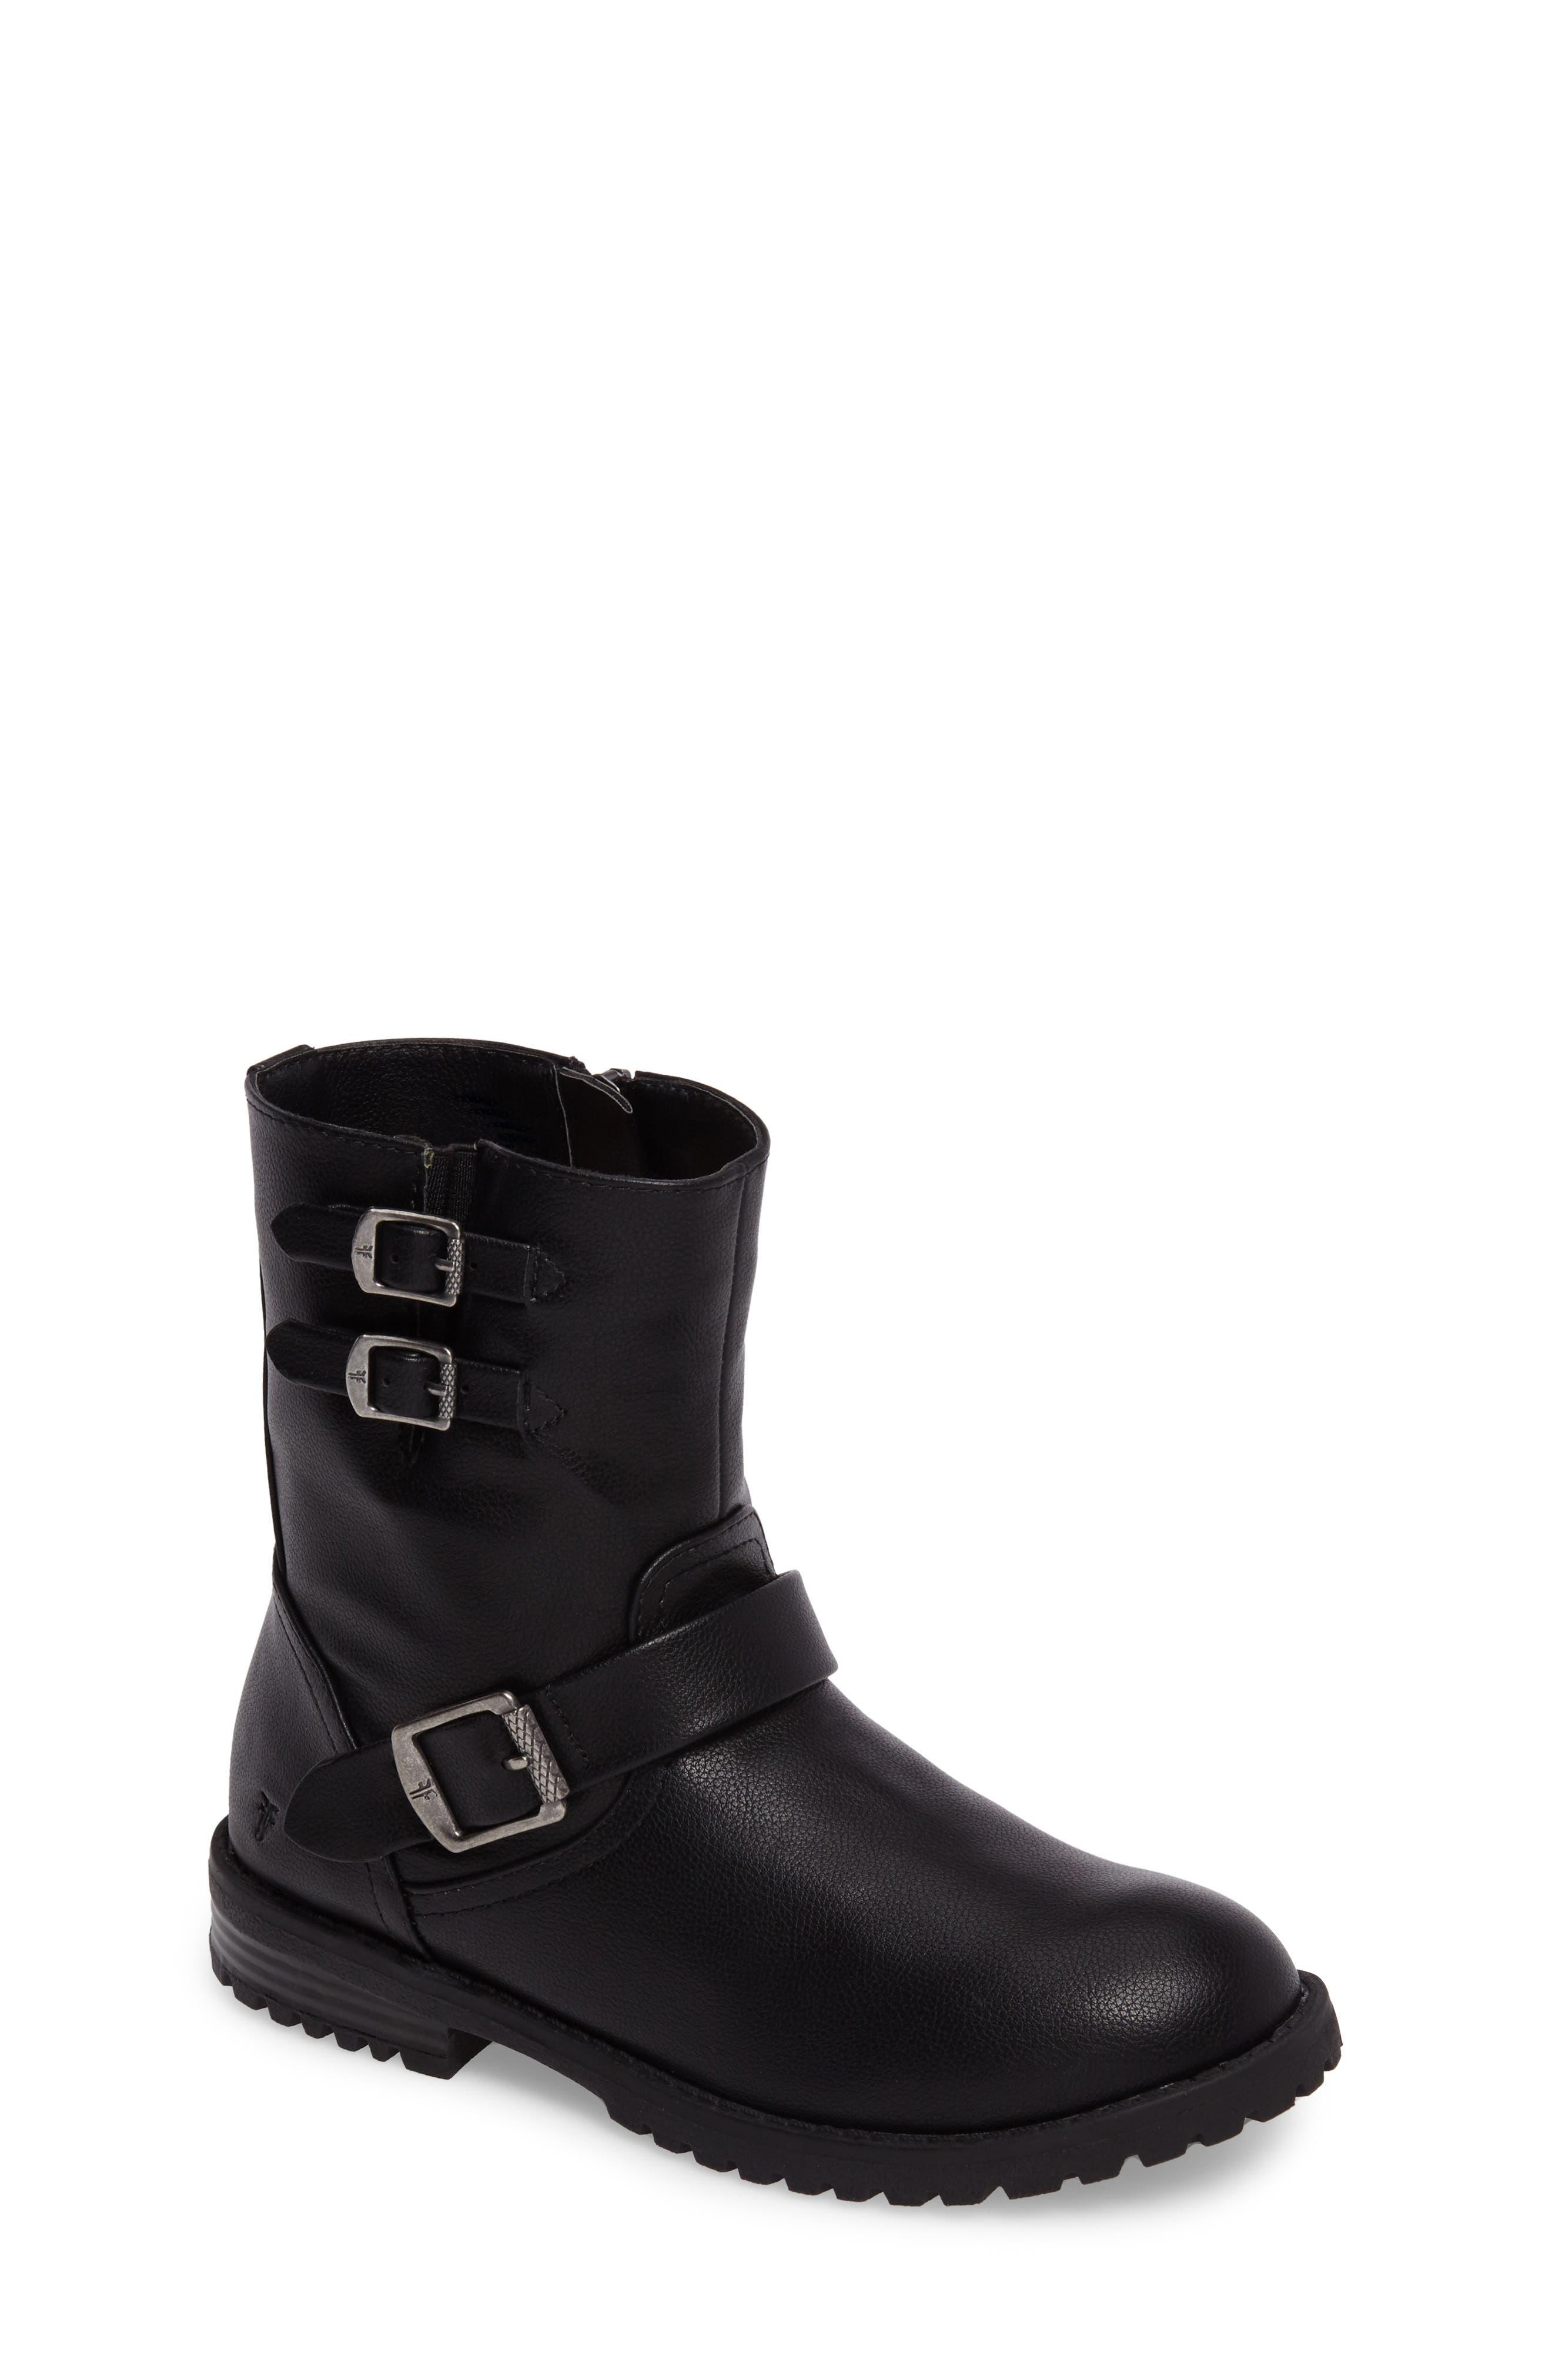 FRYE Veronica Buckle-Strap Engineer Boot, Main, color, BLACK